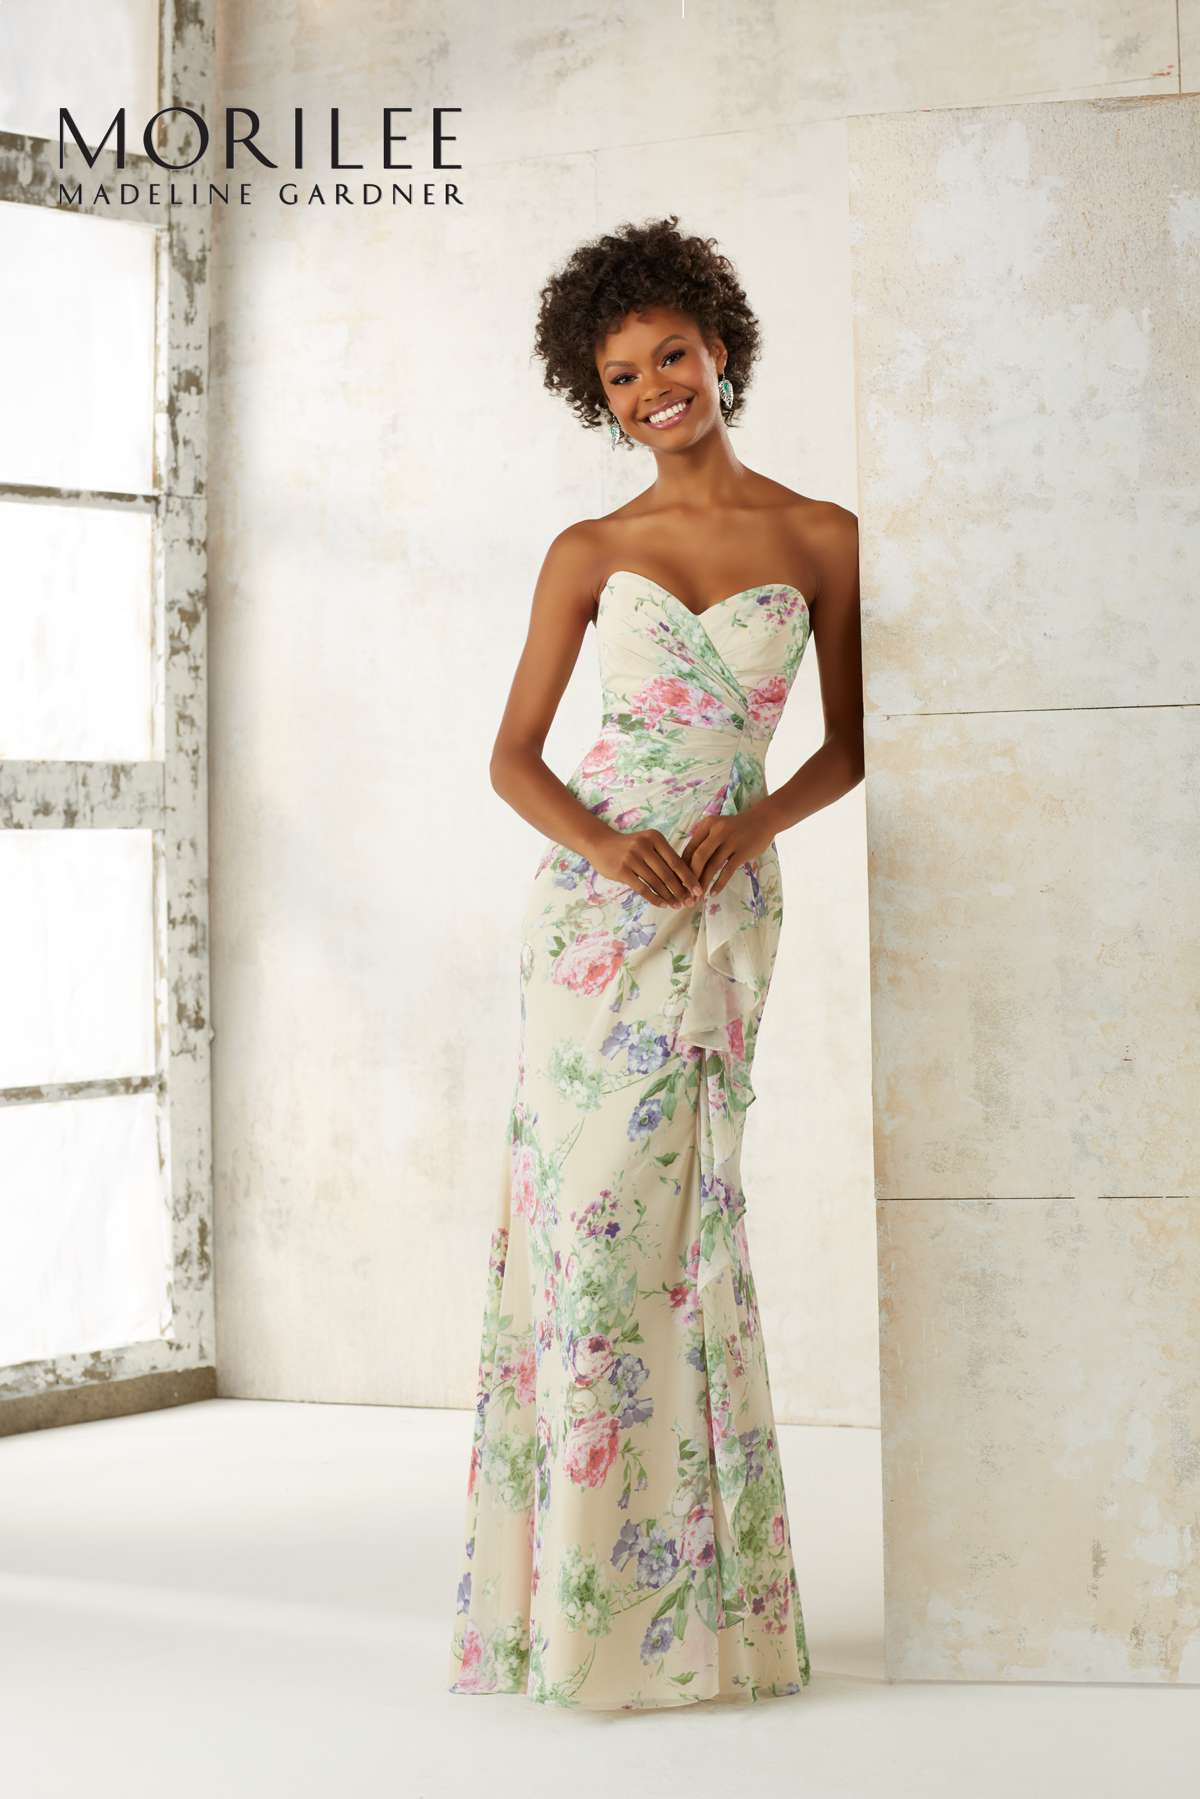 floral bridesmaid dresses 21510-0037